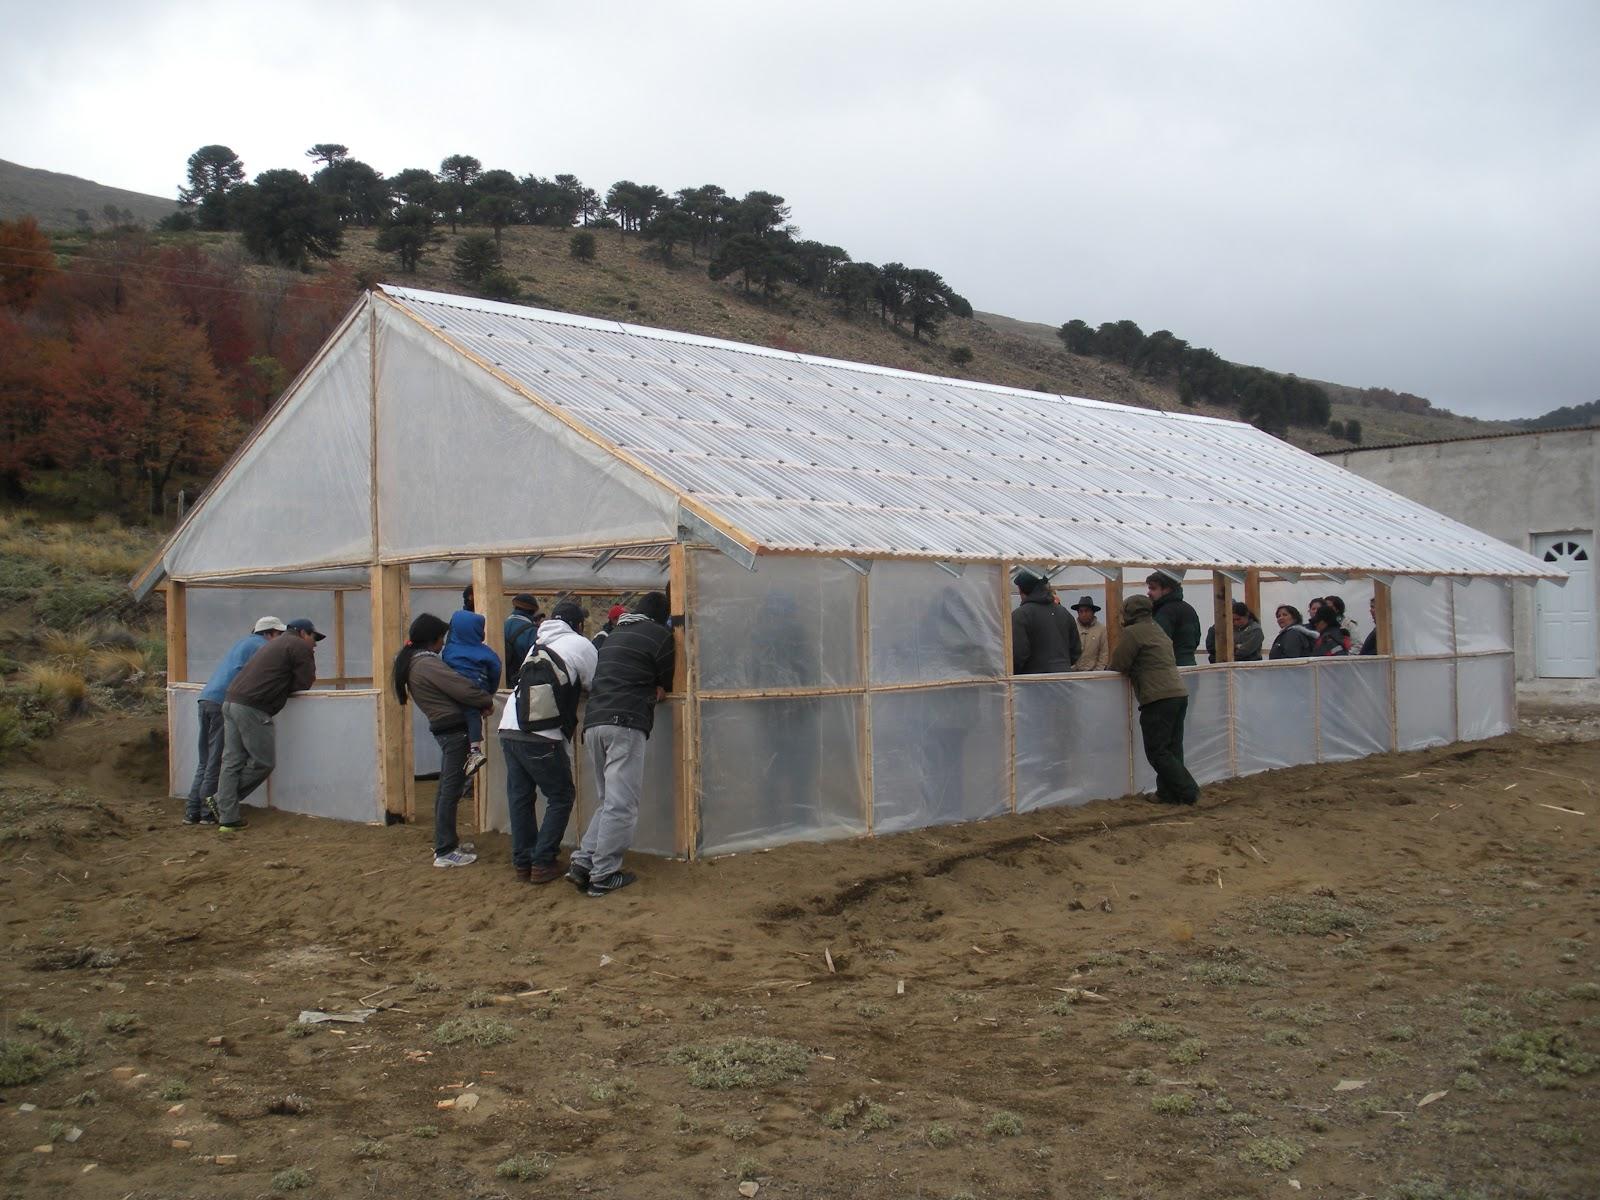 Patagonia andina forestal mayo 2013 for Proyecto productivo de vivero forestal